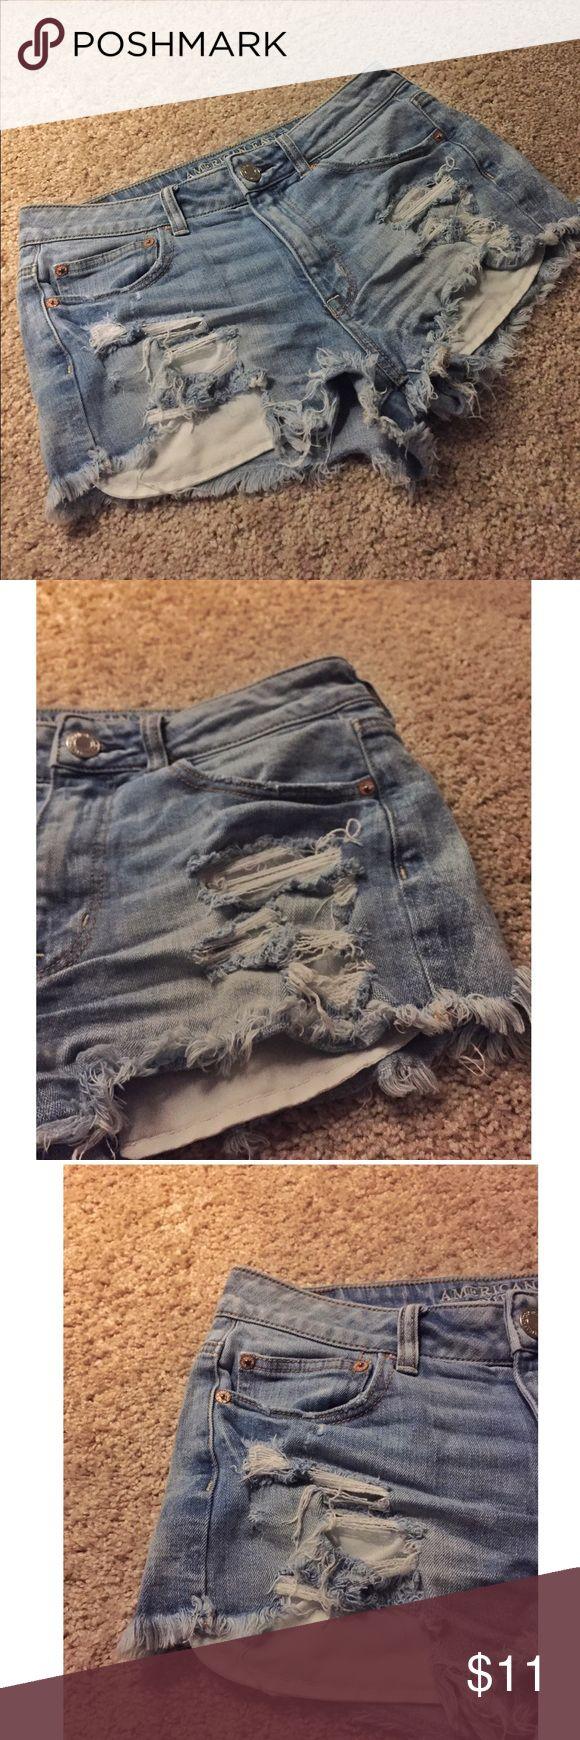 High-Rise Festival Shorts American Eagle Outfitters high rise festival shorts 🌼 American Eagle Outfitters Shorts Jean Shorts